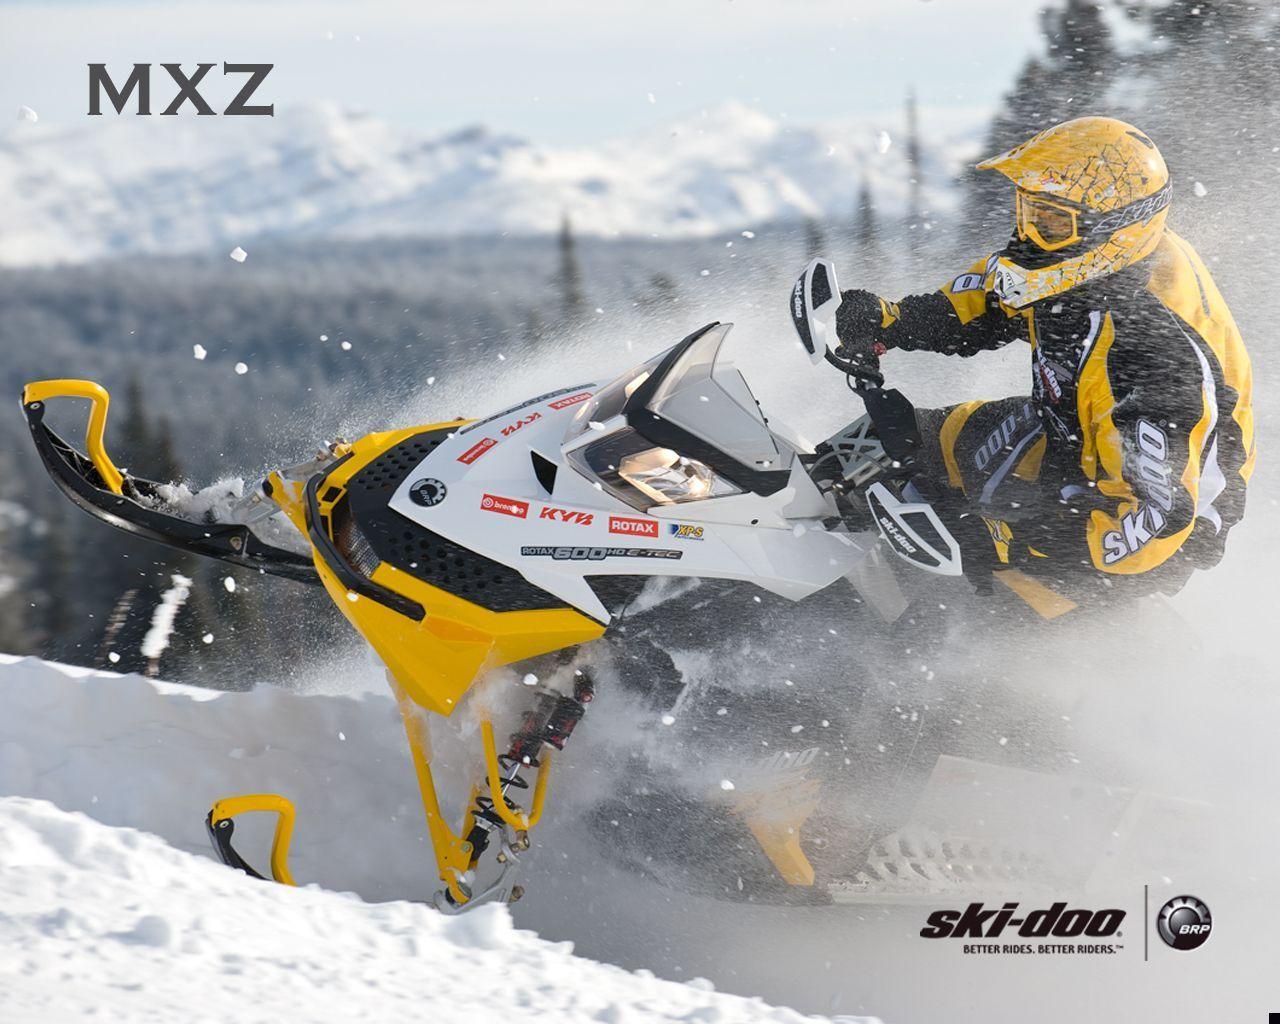 Ski Doo Wallpapers 1280x1024